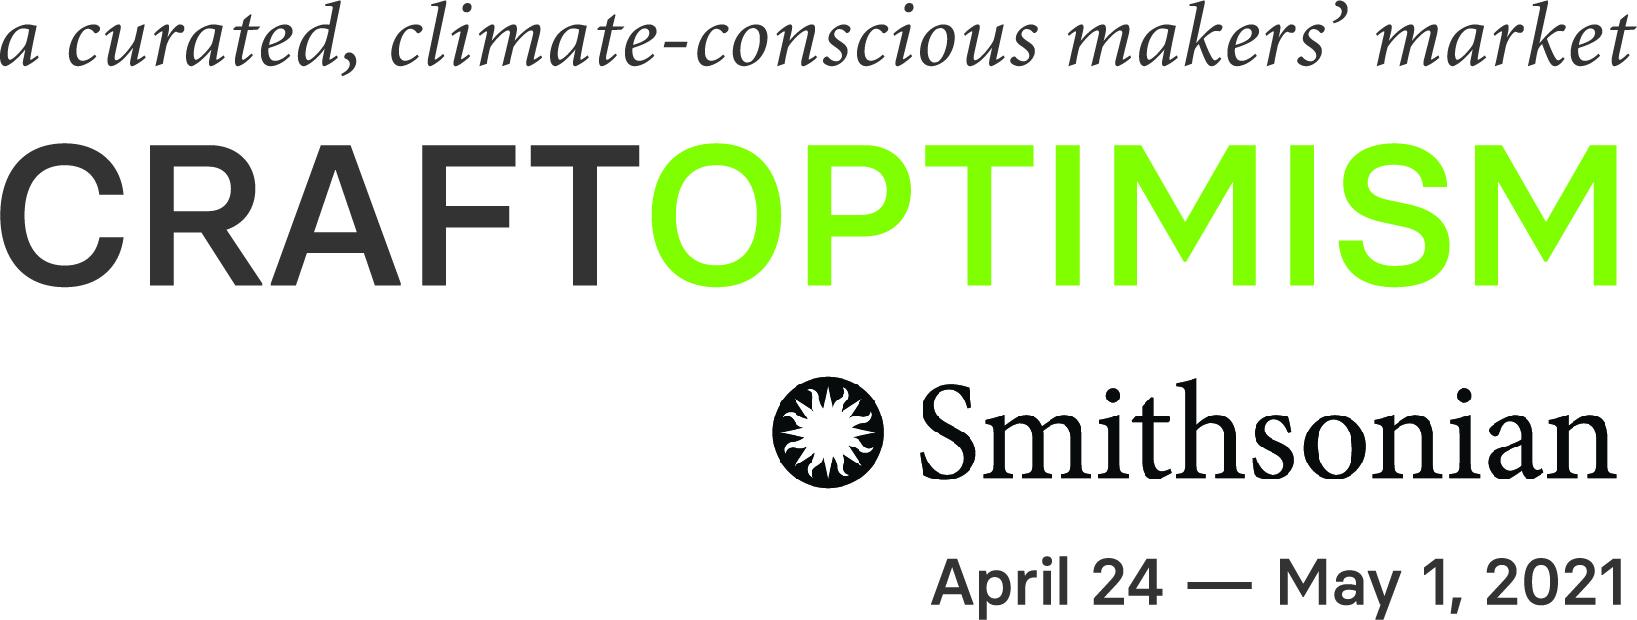 Smithsonian CraftOptimism Logo